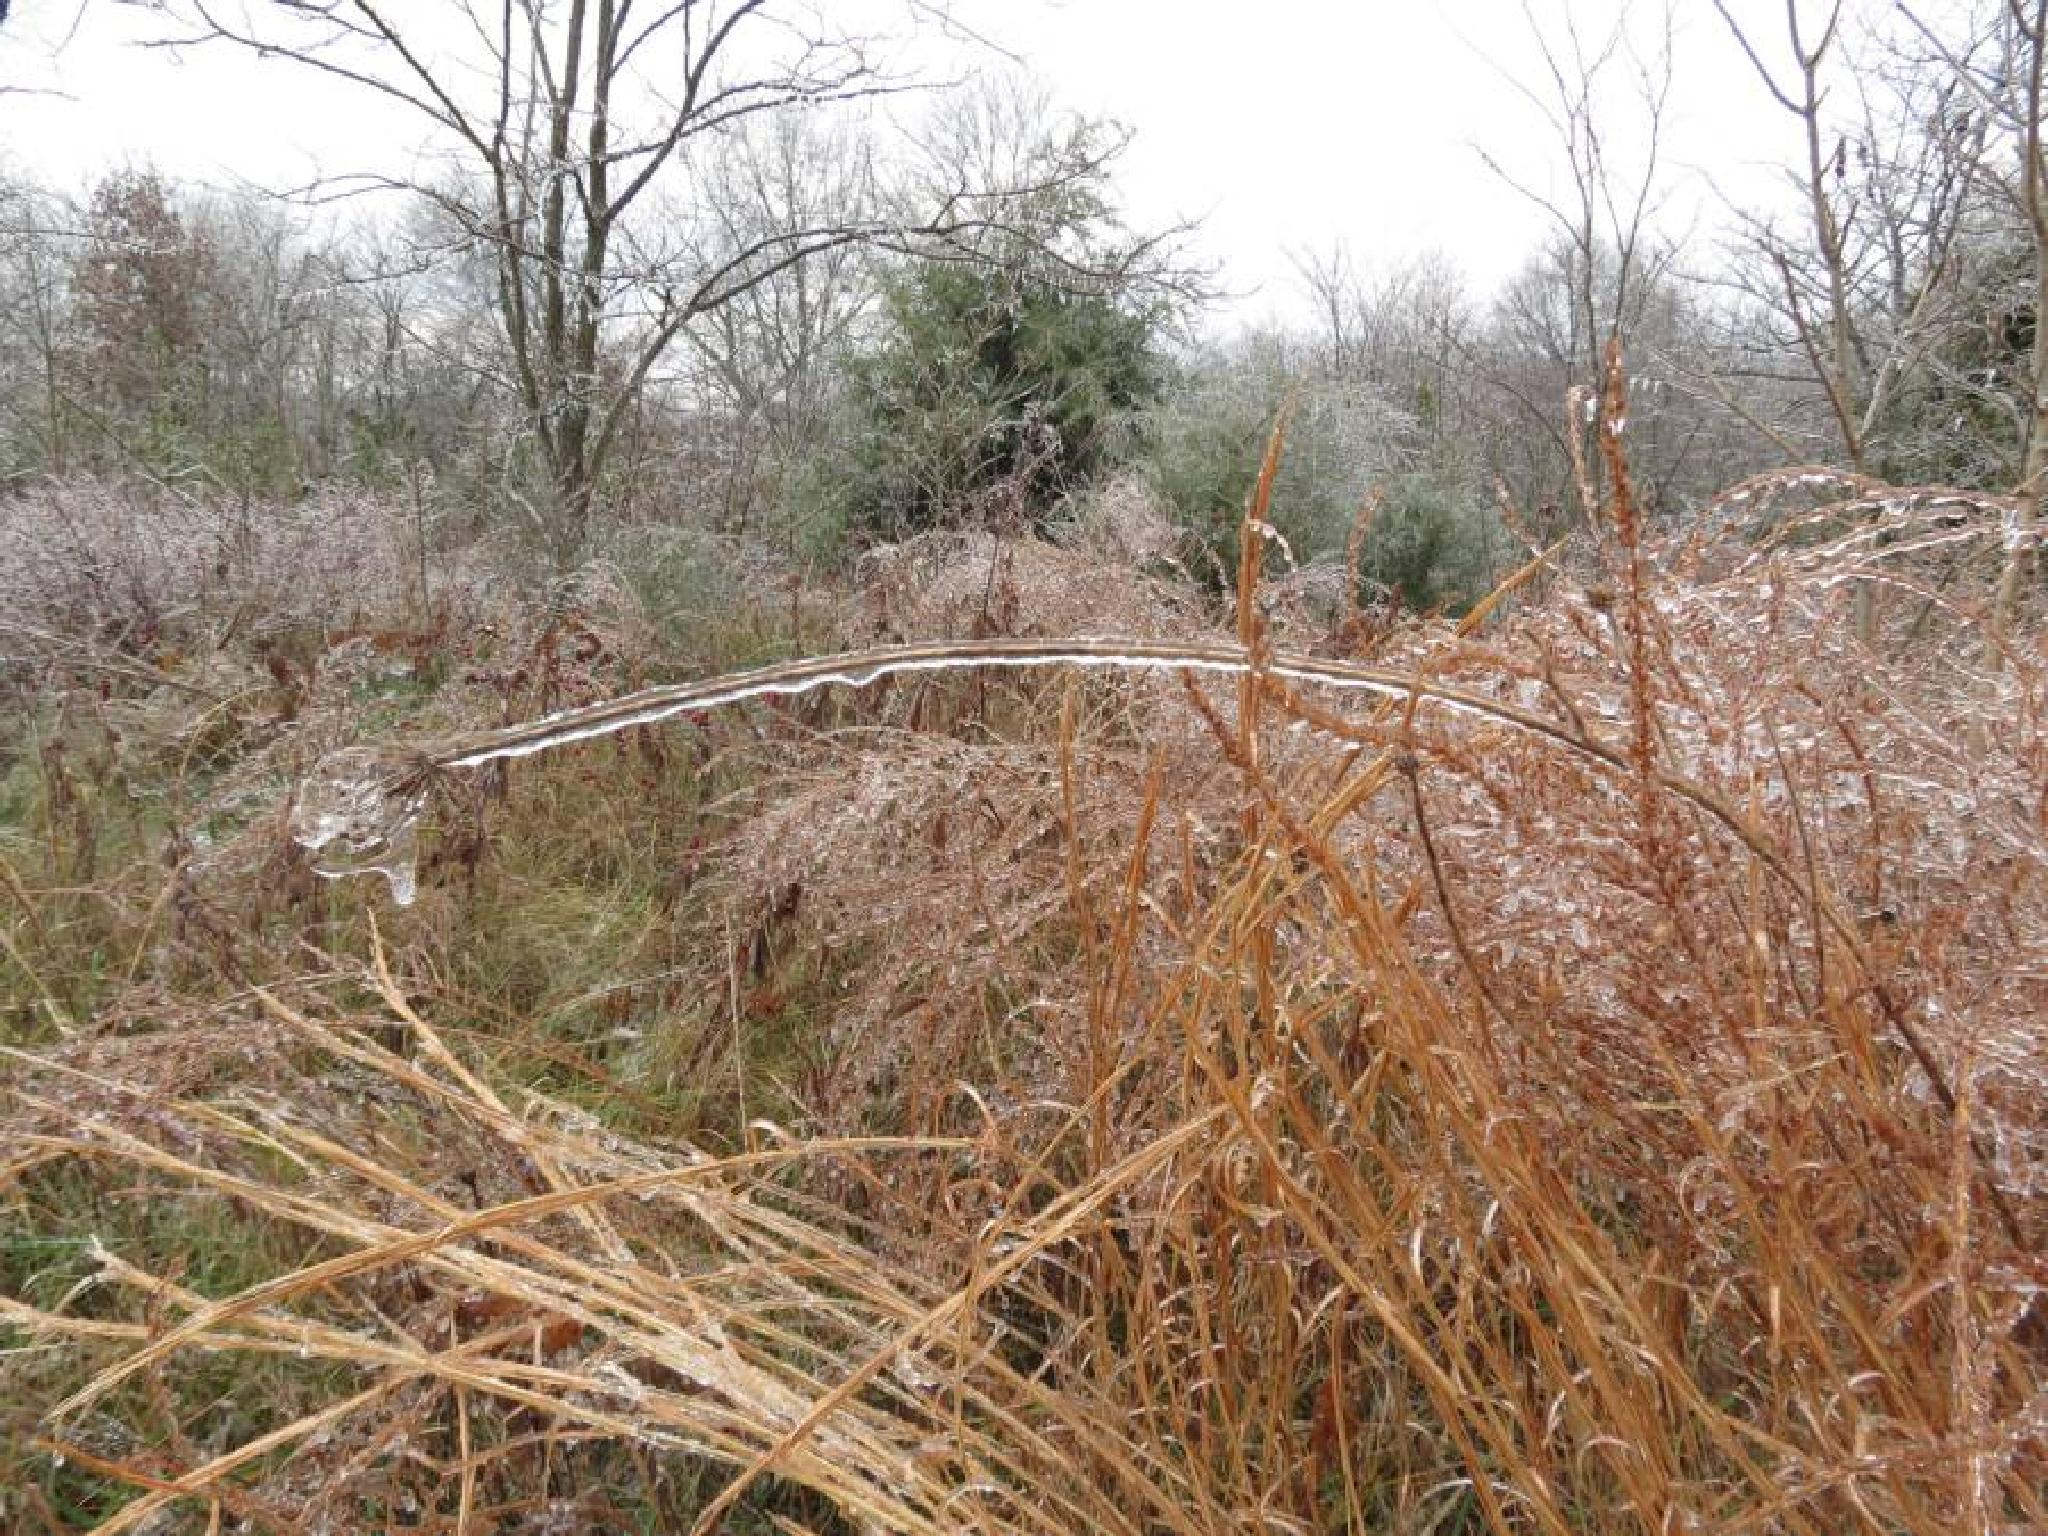 Icy Grasp by pauline.burden.60